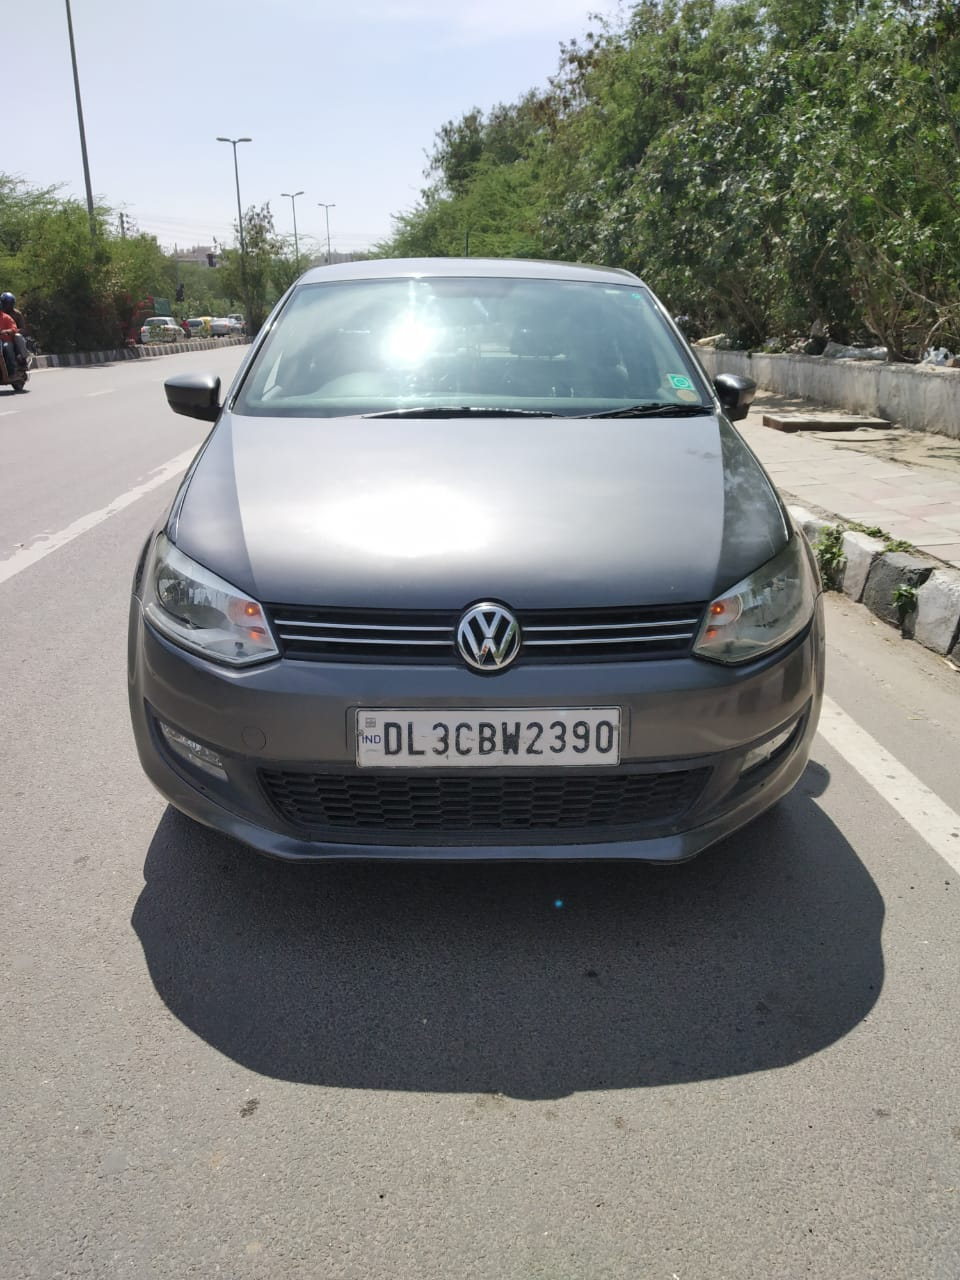 2013 Used Volkswagen Polo COMFORTLINE 1.2L PETROL